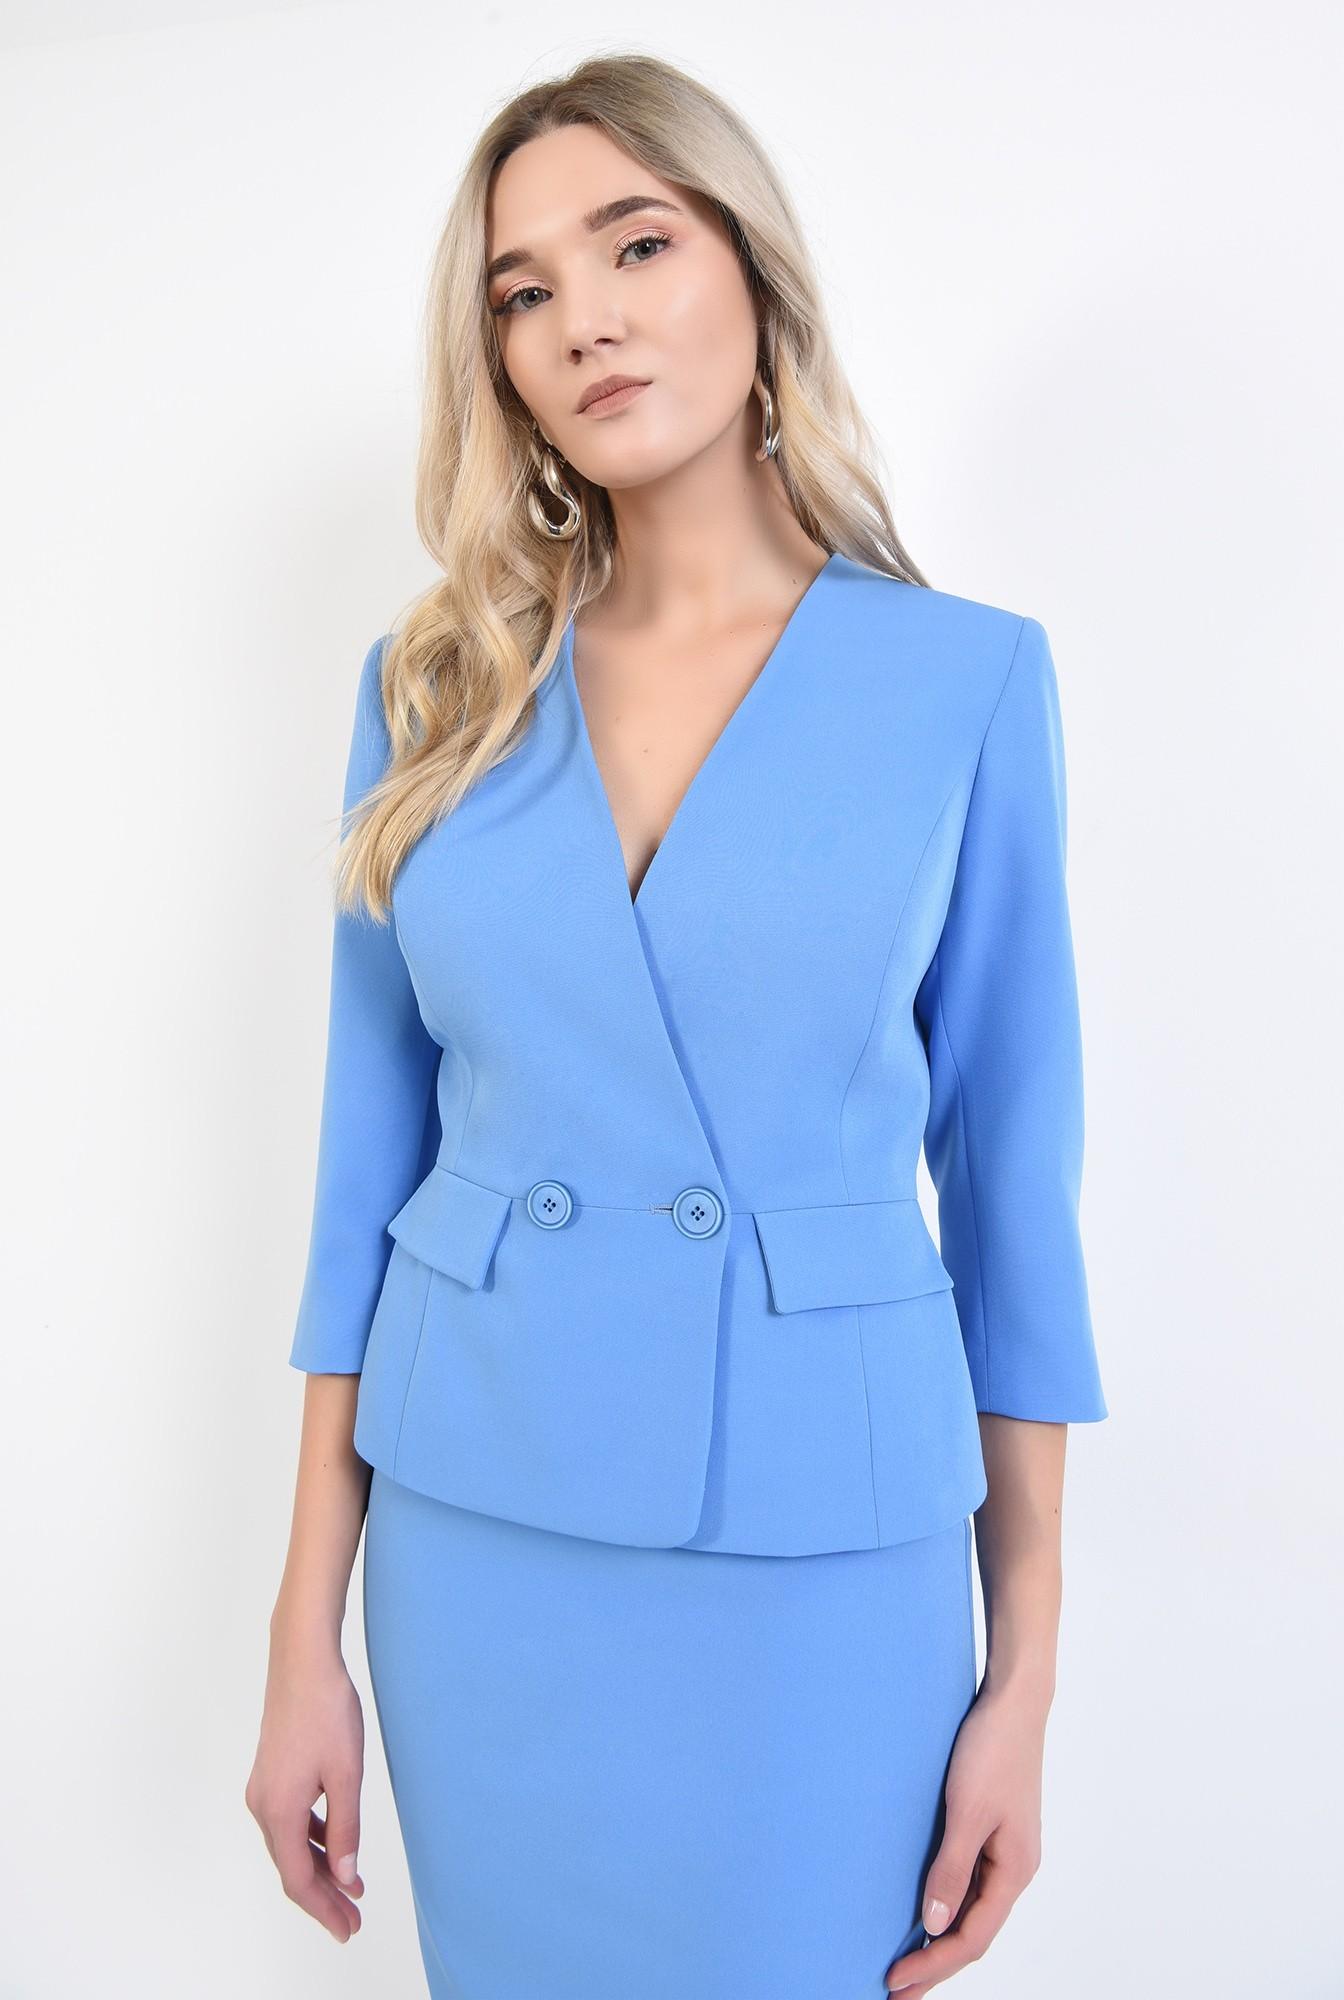 2 - 360 - sacou bleu, office, costum, buzunare cu clapa, anchior petrecut